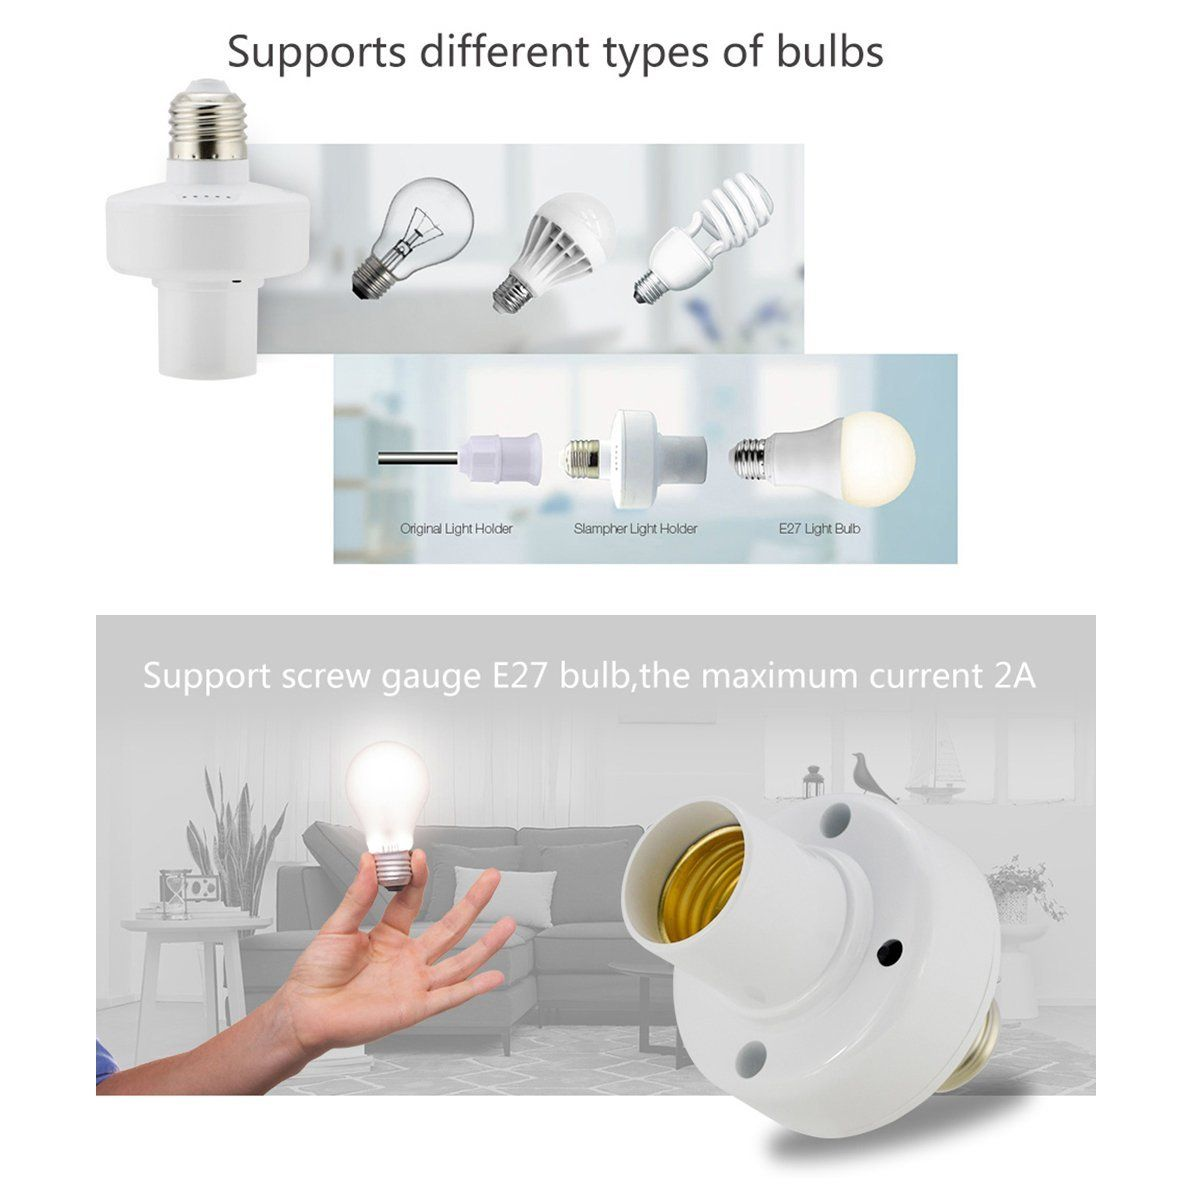 Modulo Smart Sonoff slampher lamp Holder bivolt Wifi - JS Soluções em Segurança